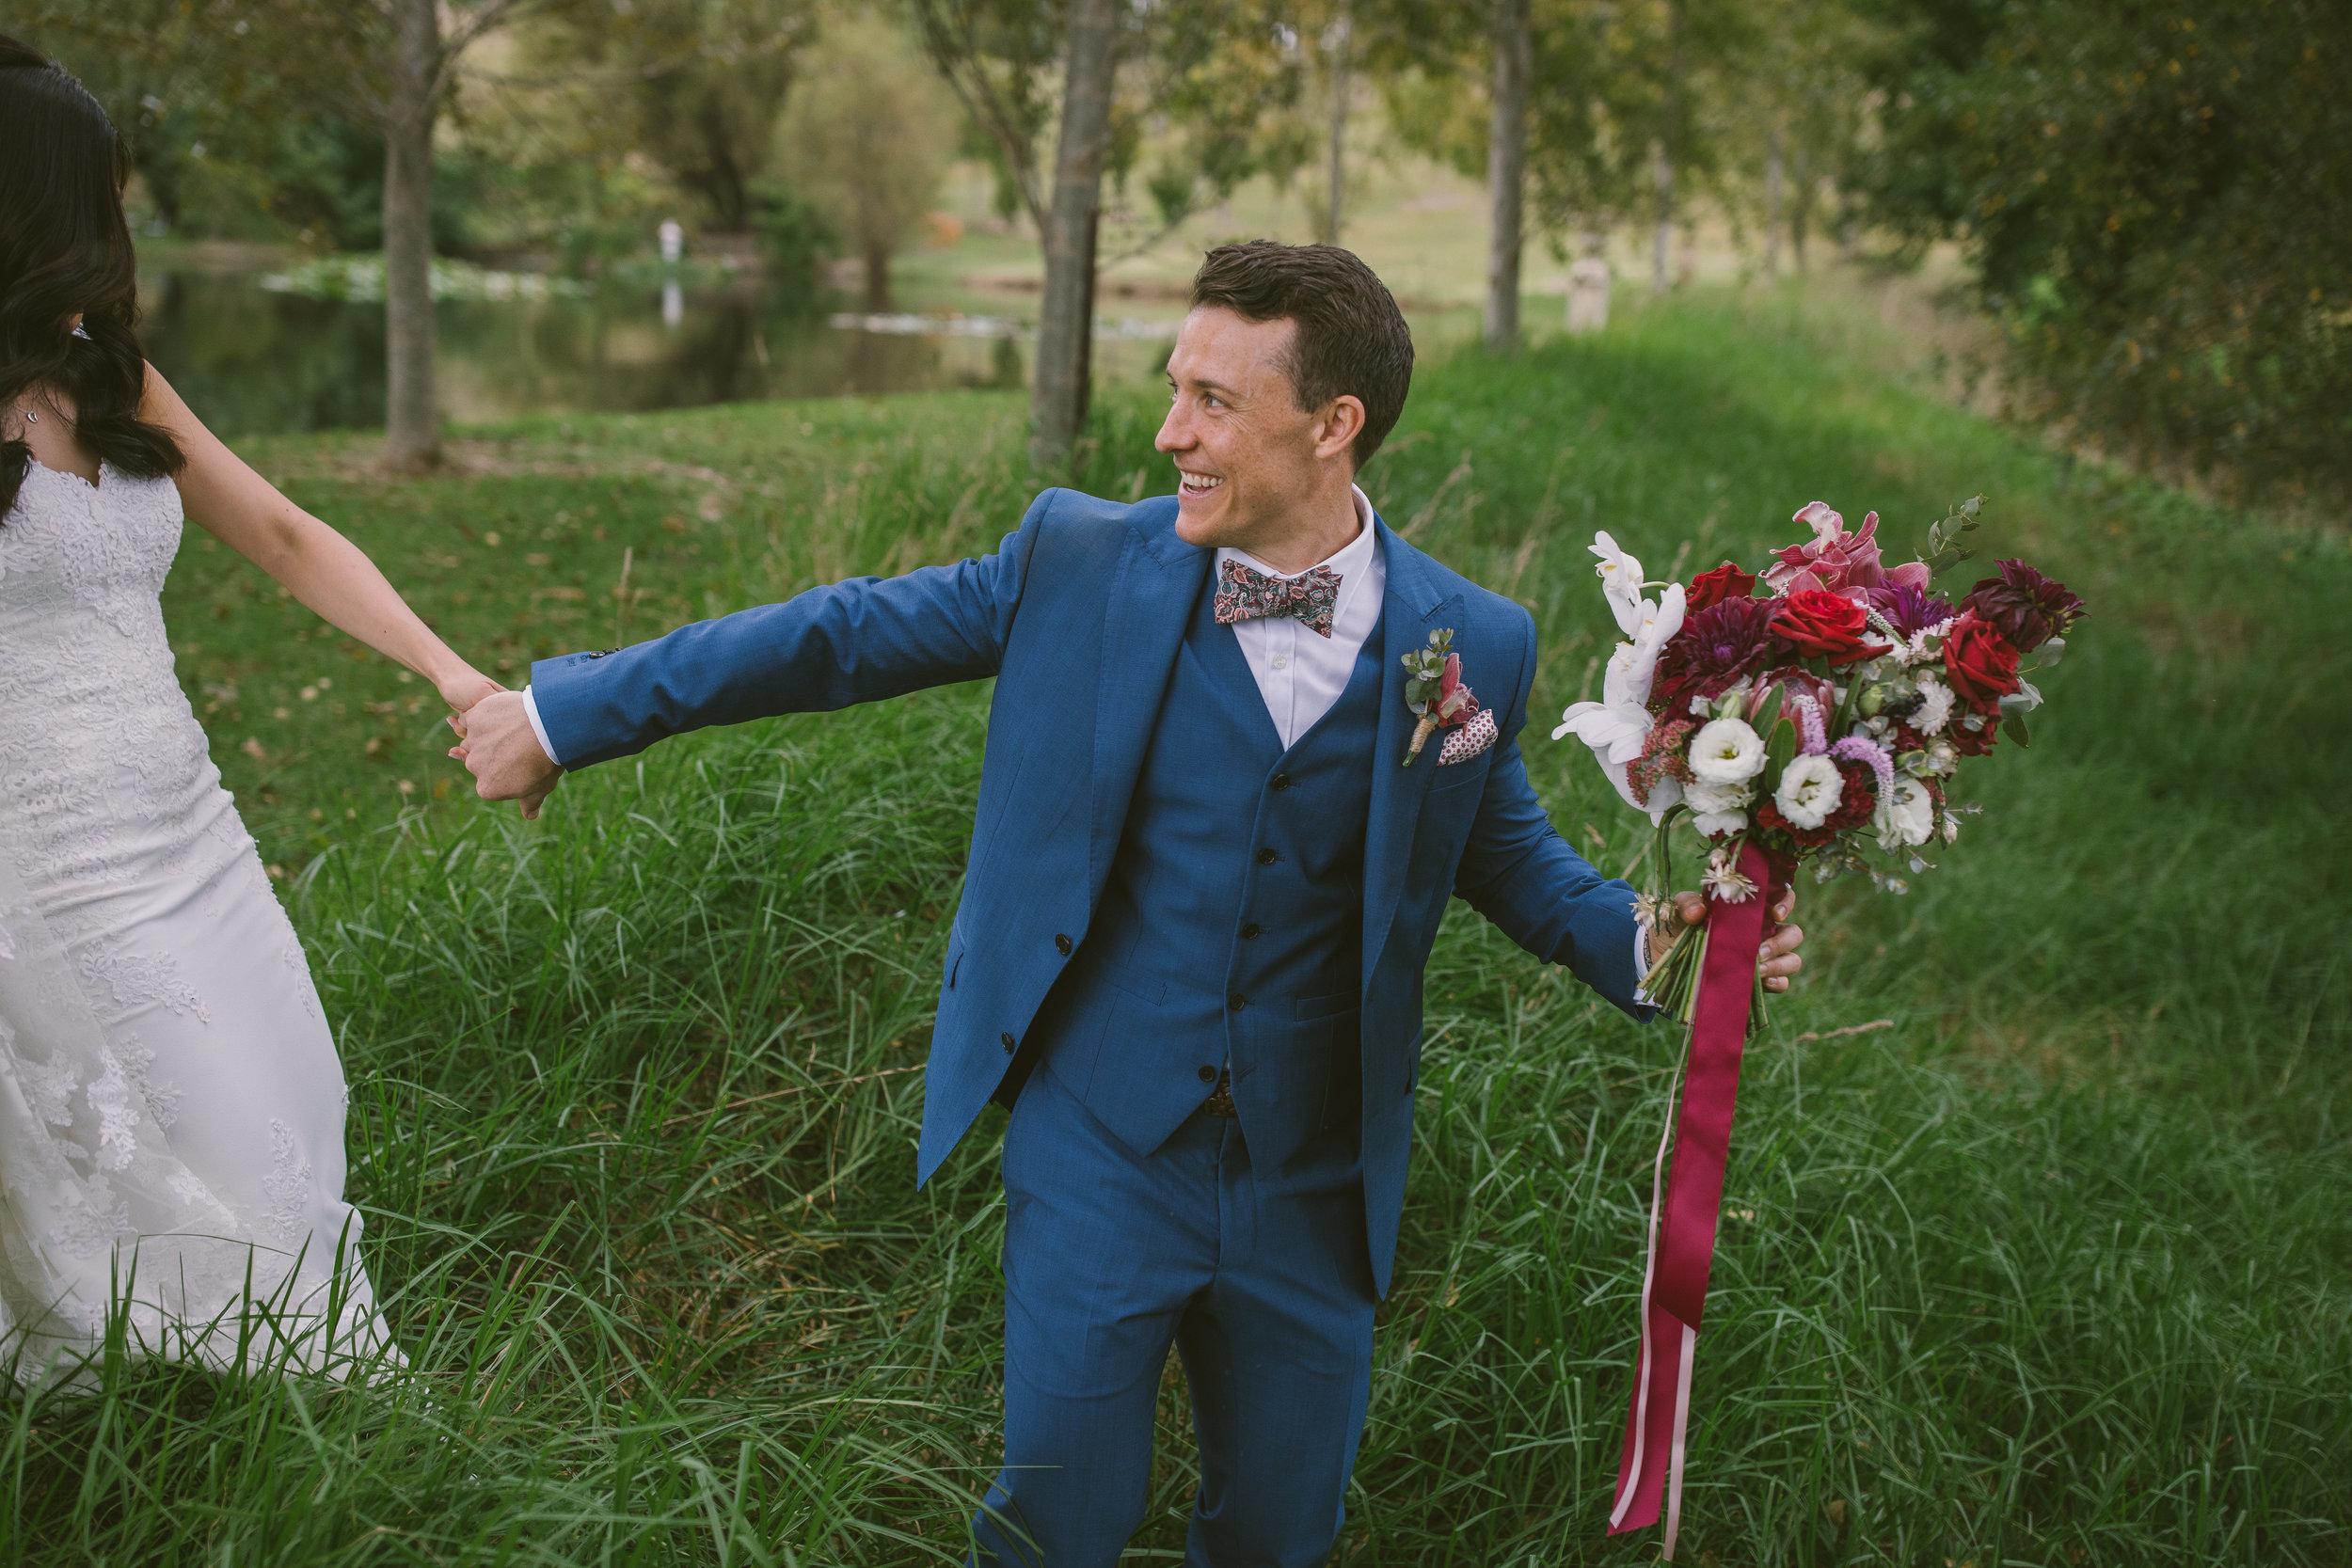 Sarah + Jason - Mali Brae Farm Wedding Photographer - Magnus Agren Photography-0484.jpg